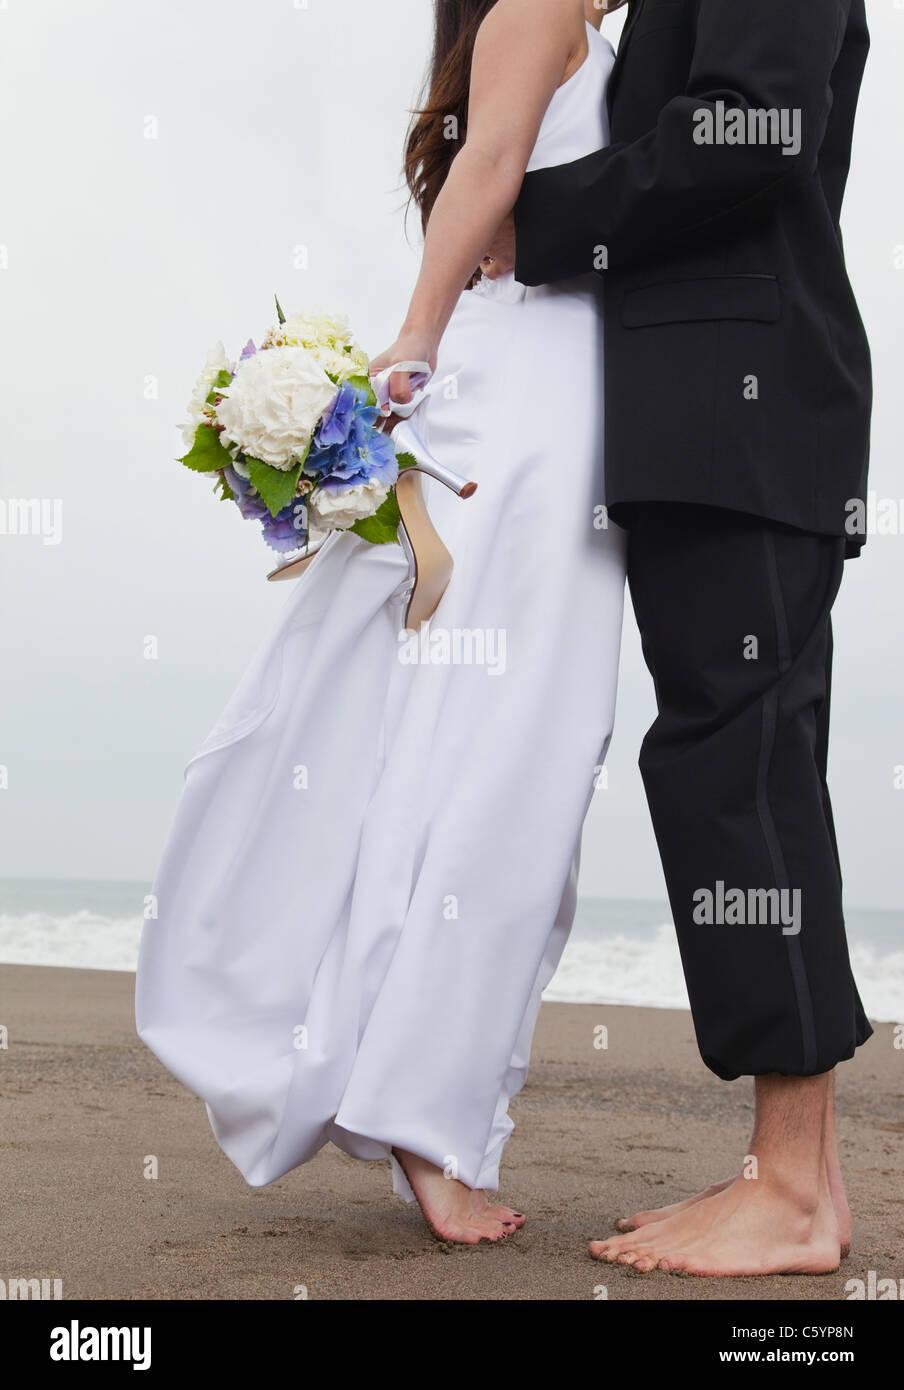 USA, California, San Francisco, Baker Beach, bride and groom walking on beach Stock Photo